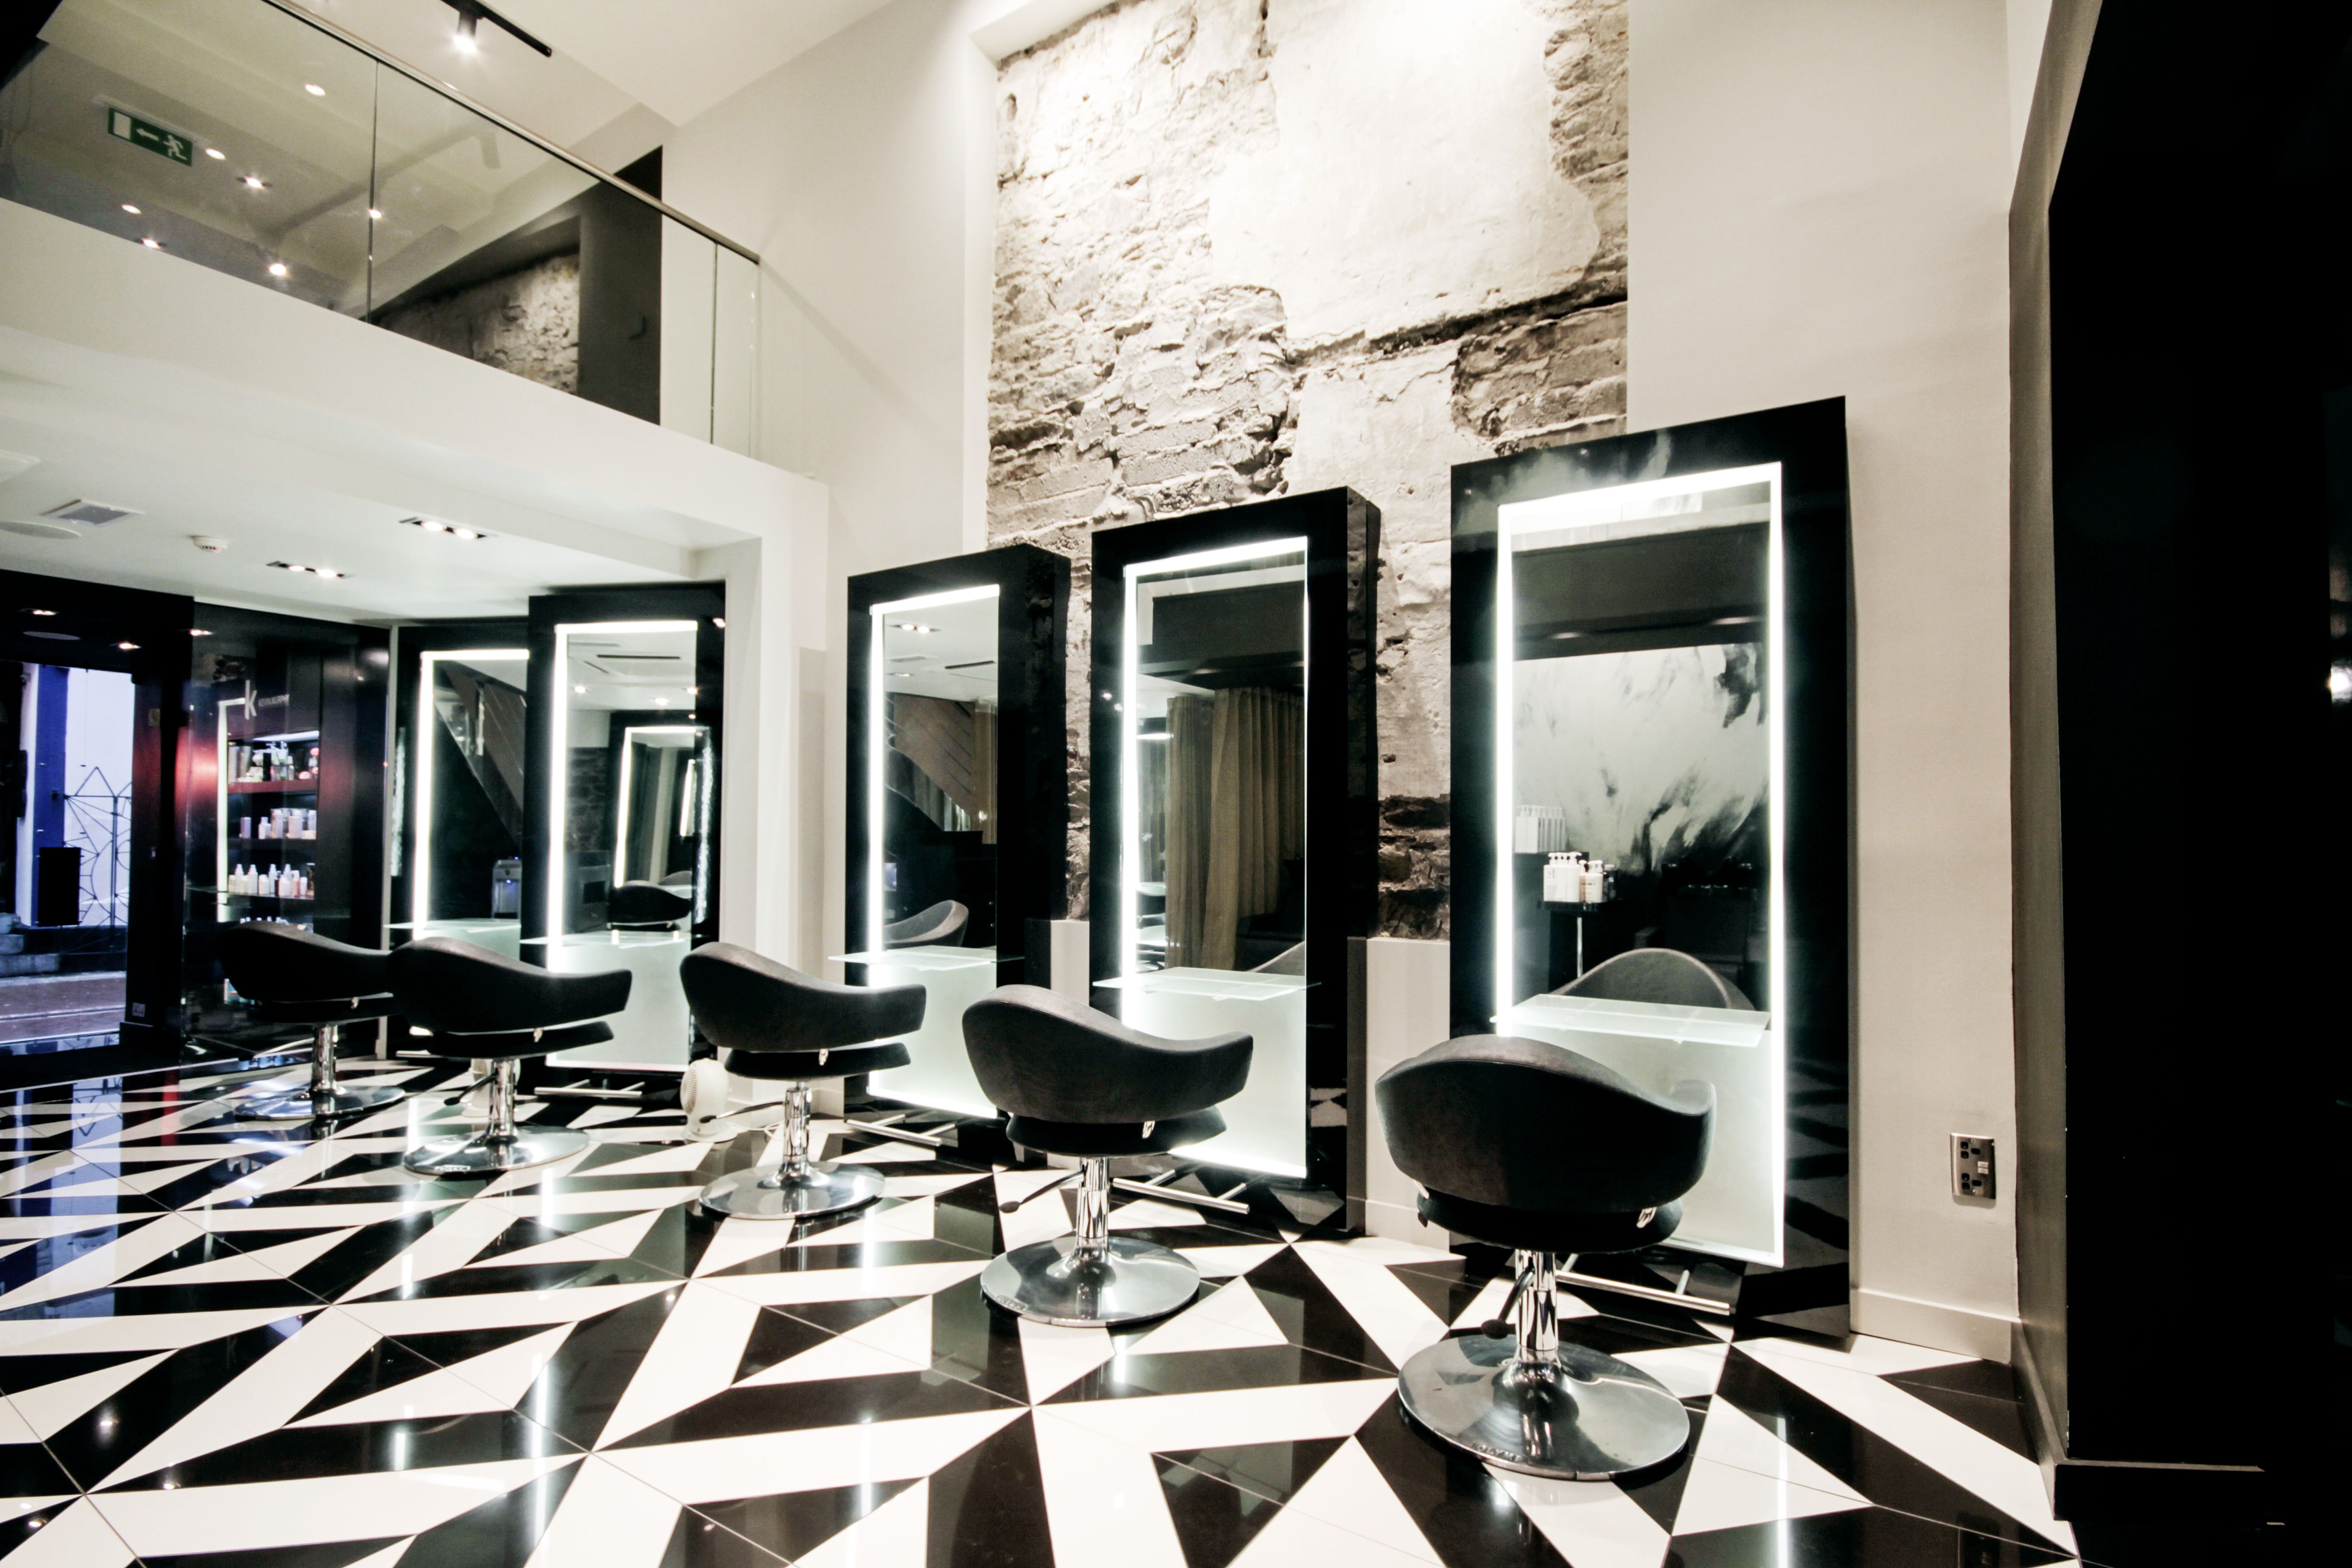 High end boutique hair salon interiordesign hairsalon tilefloor high end boutique hair salon interiordesign hairsalon tilefloor tile floor dailygadgetfo Choice Image